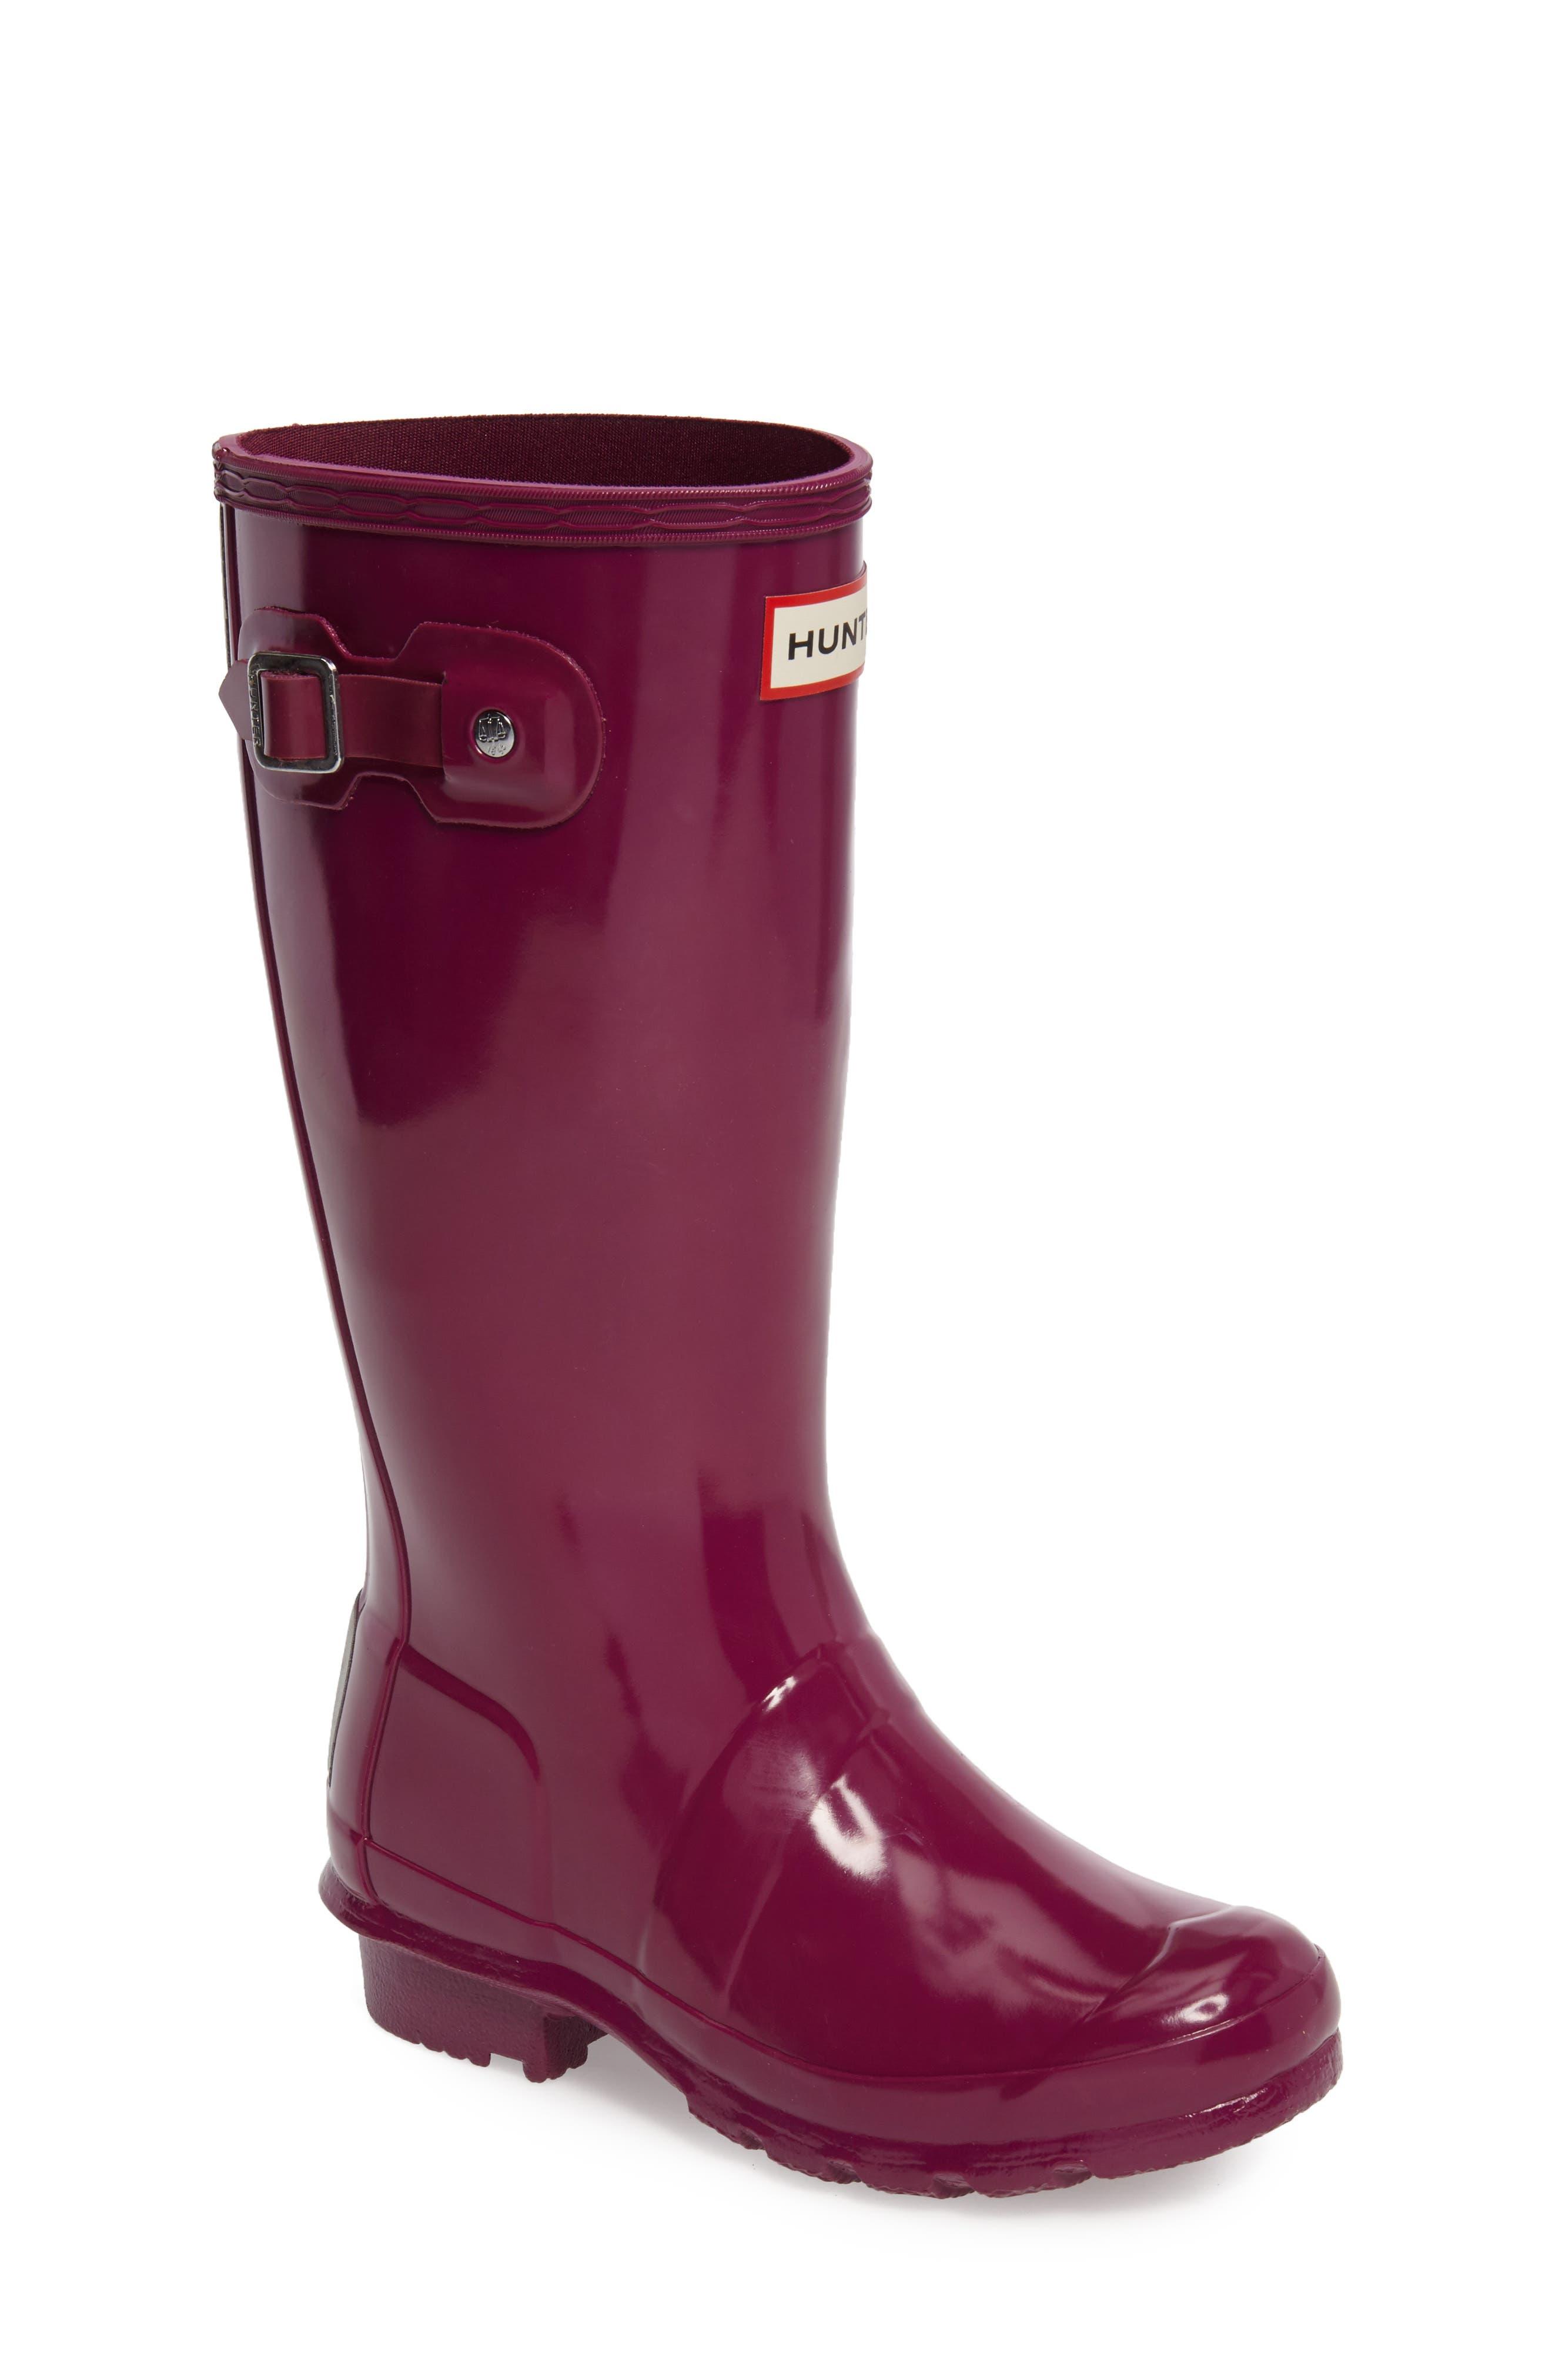 Alternate Image 1 Selected - Hunter 'Original Gloss' Rain Boot (Little Kid & Big Kid)